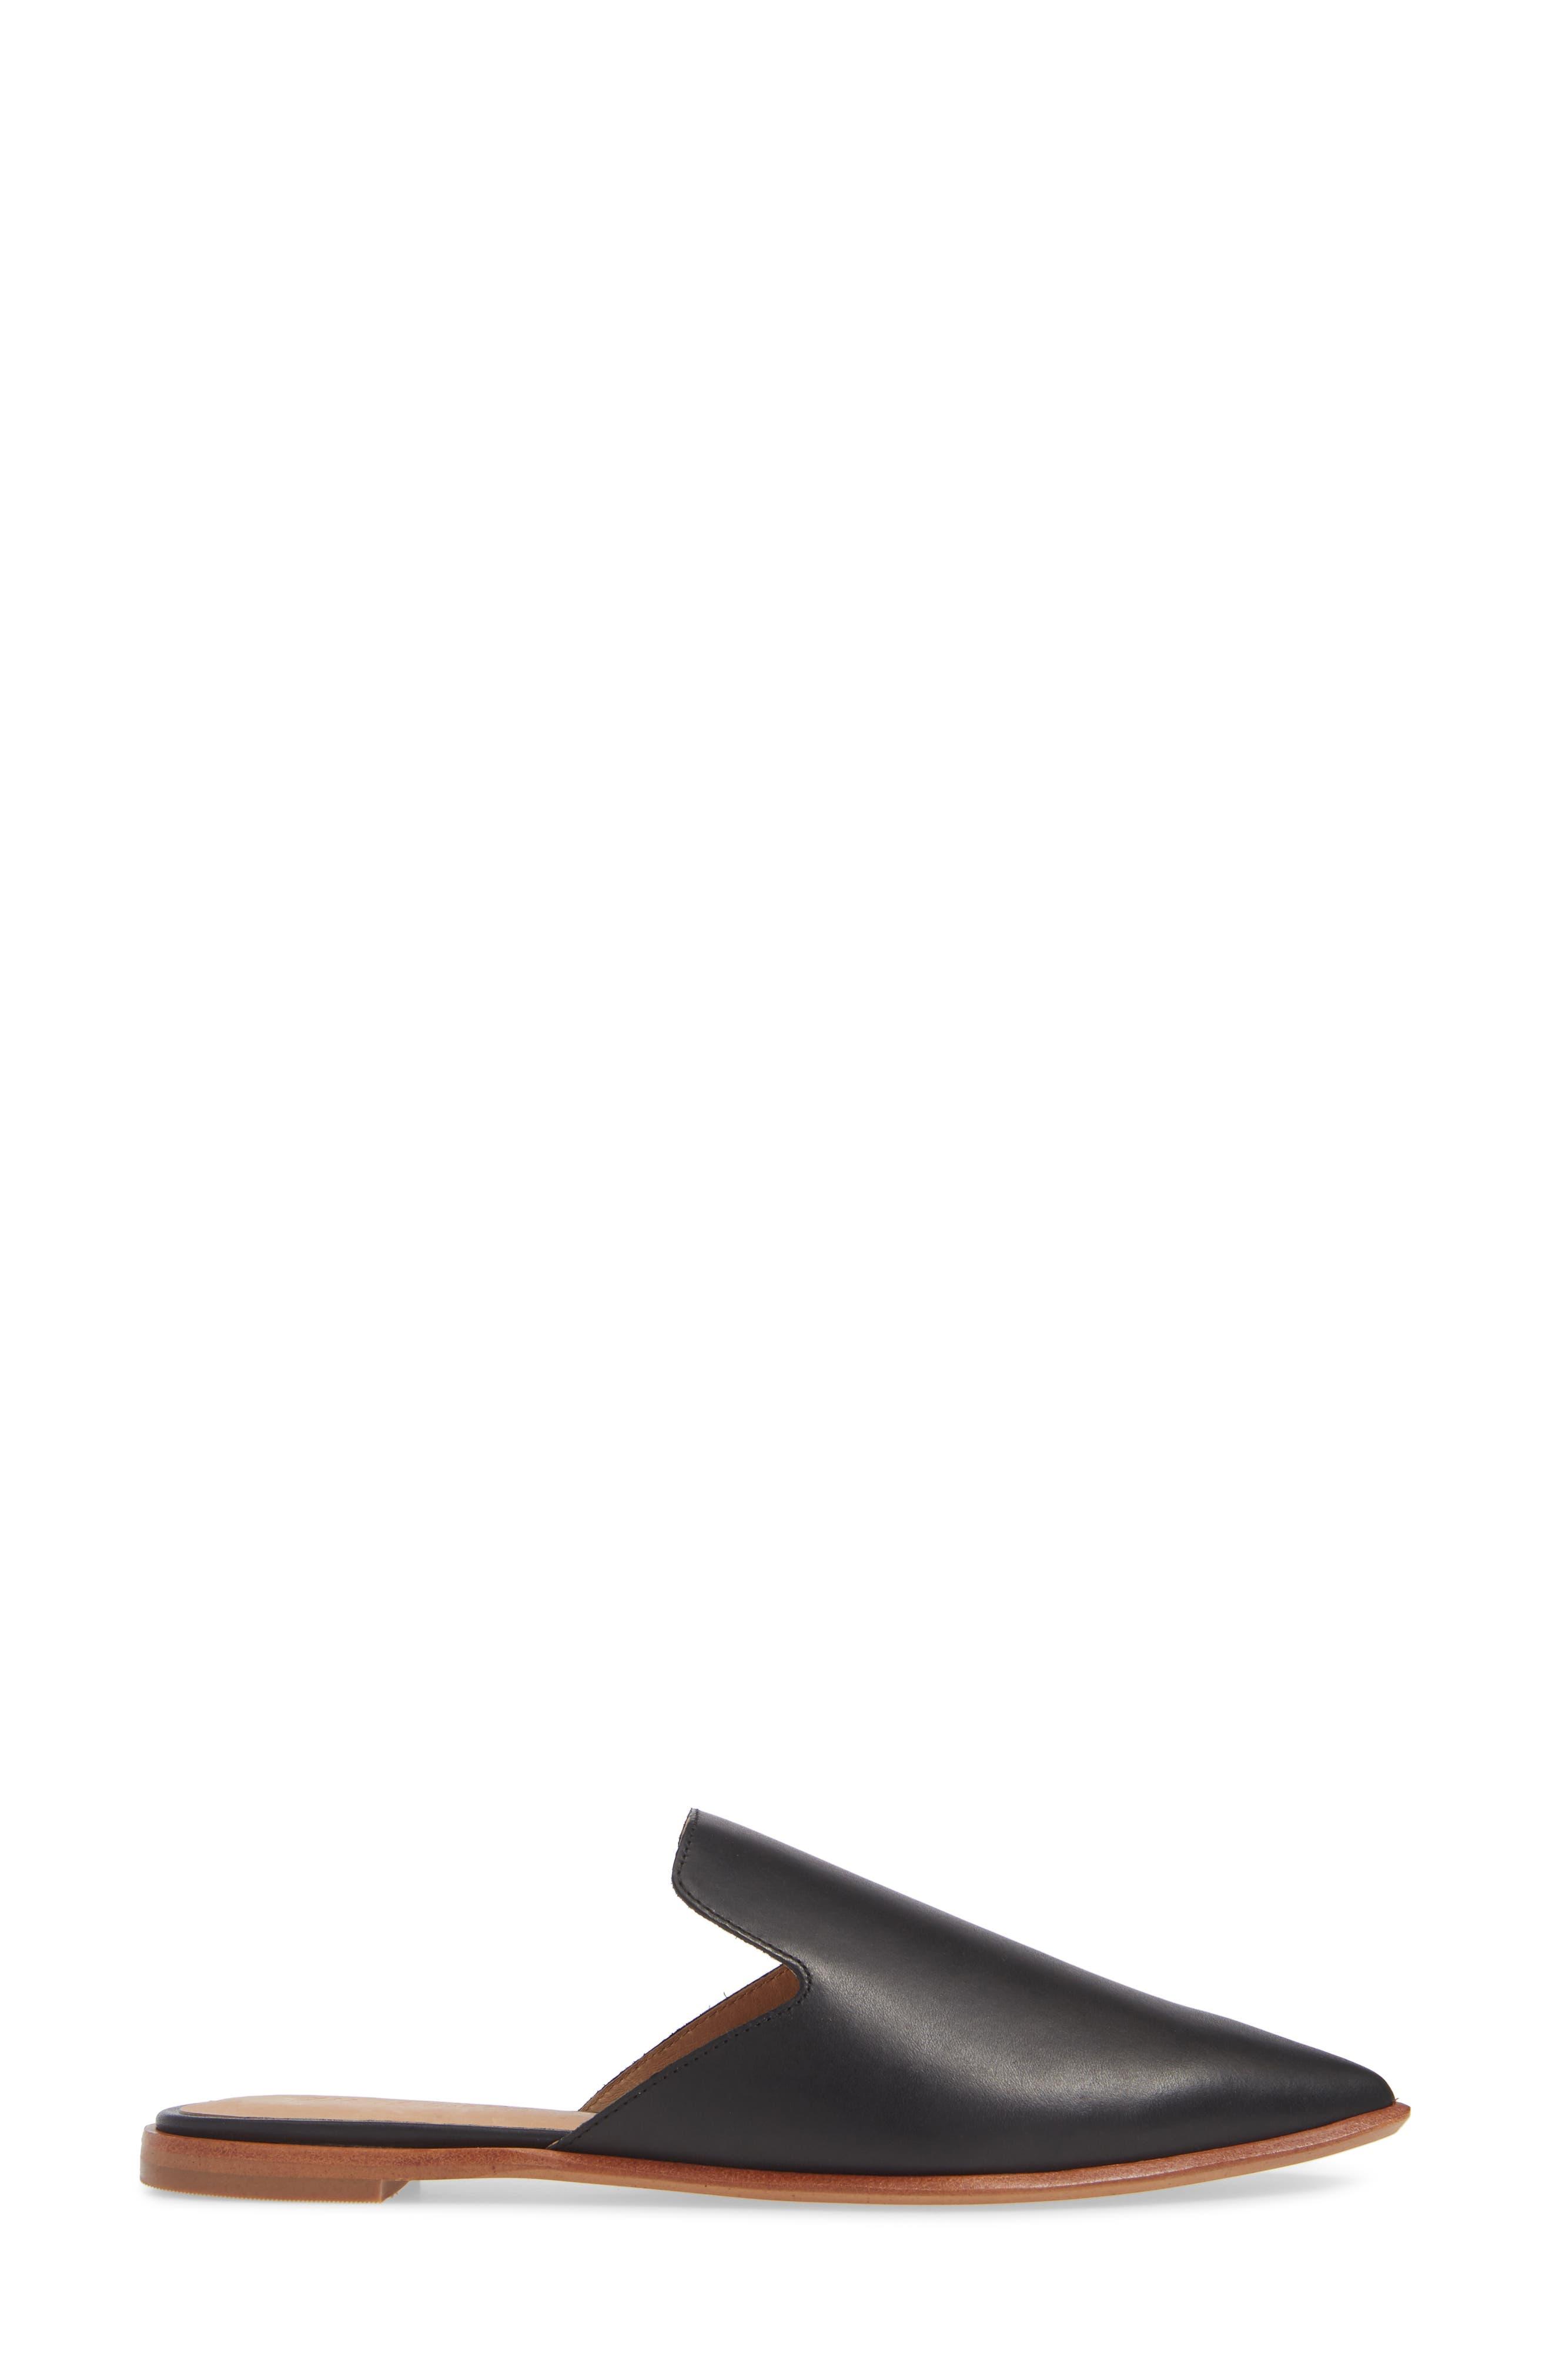 MADEWELL, The Gemma Mule, Alternate thumbnail 3, color, TRUE BLACK LEATHER